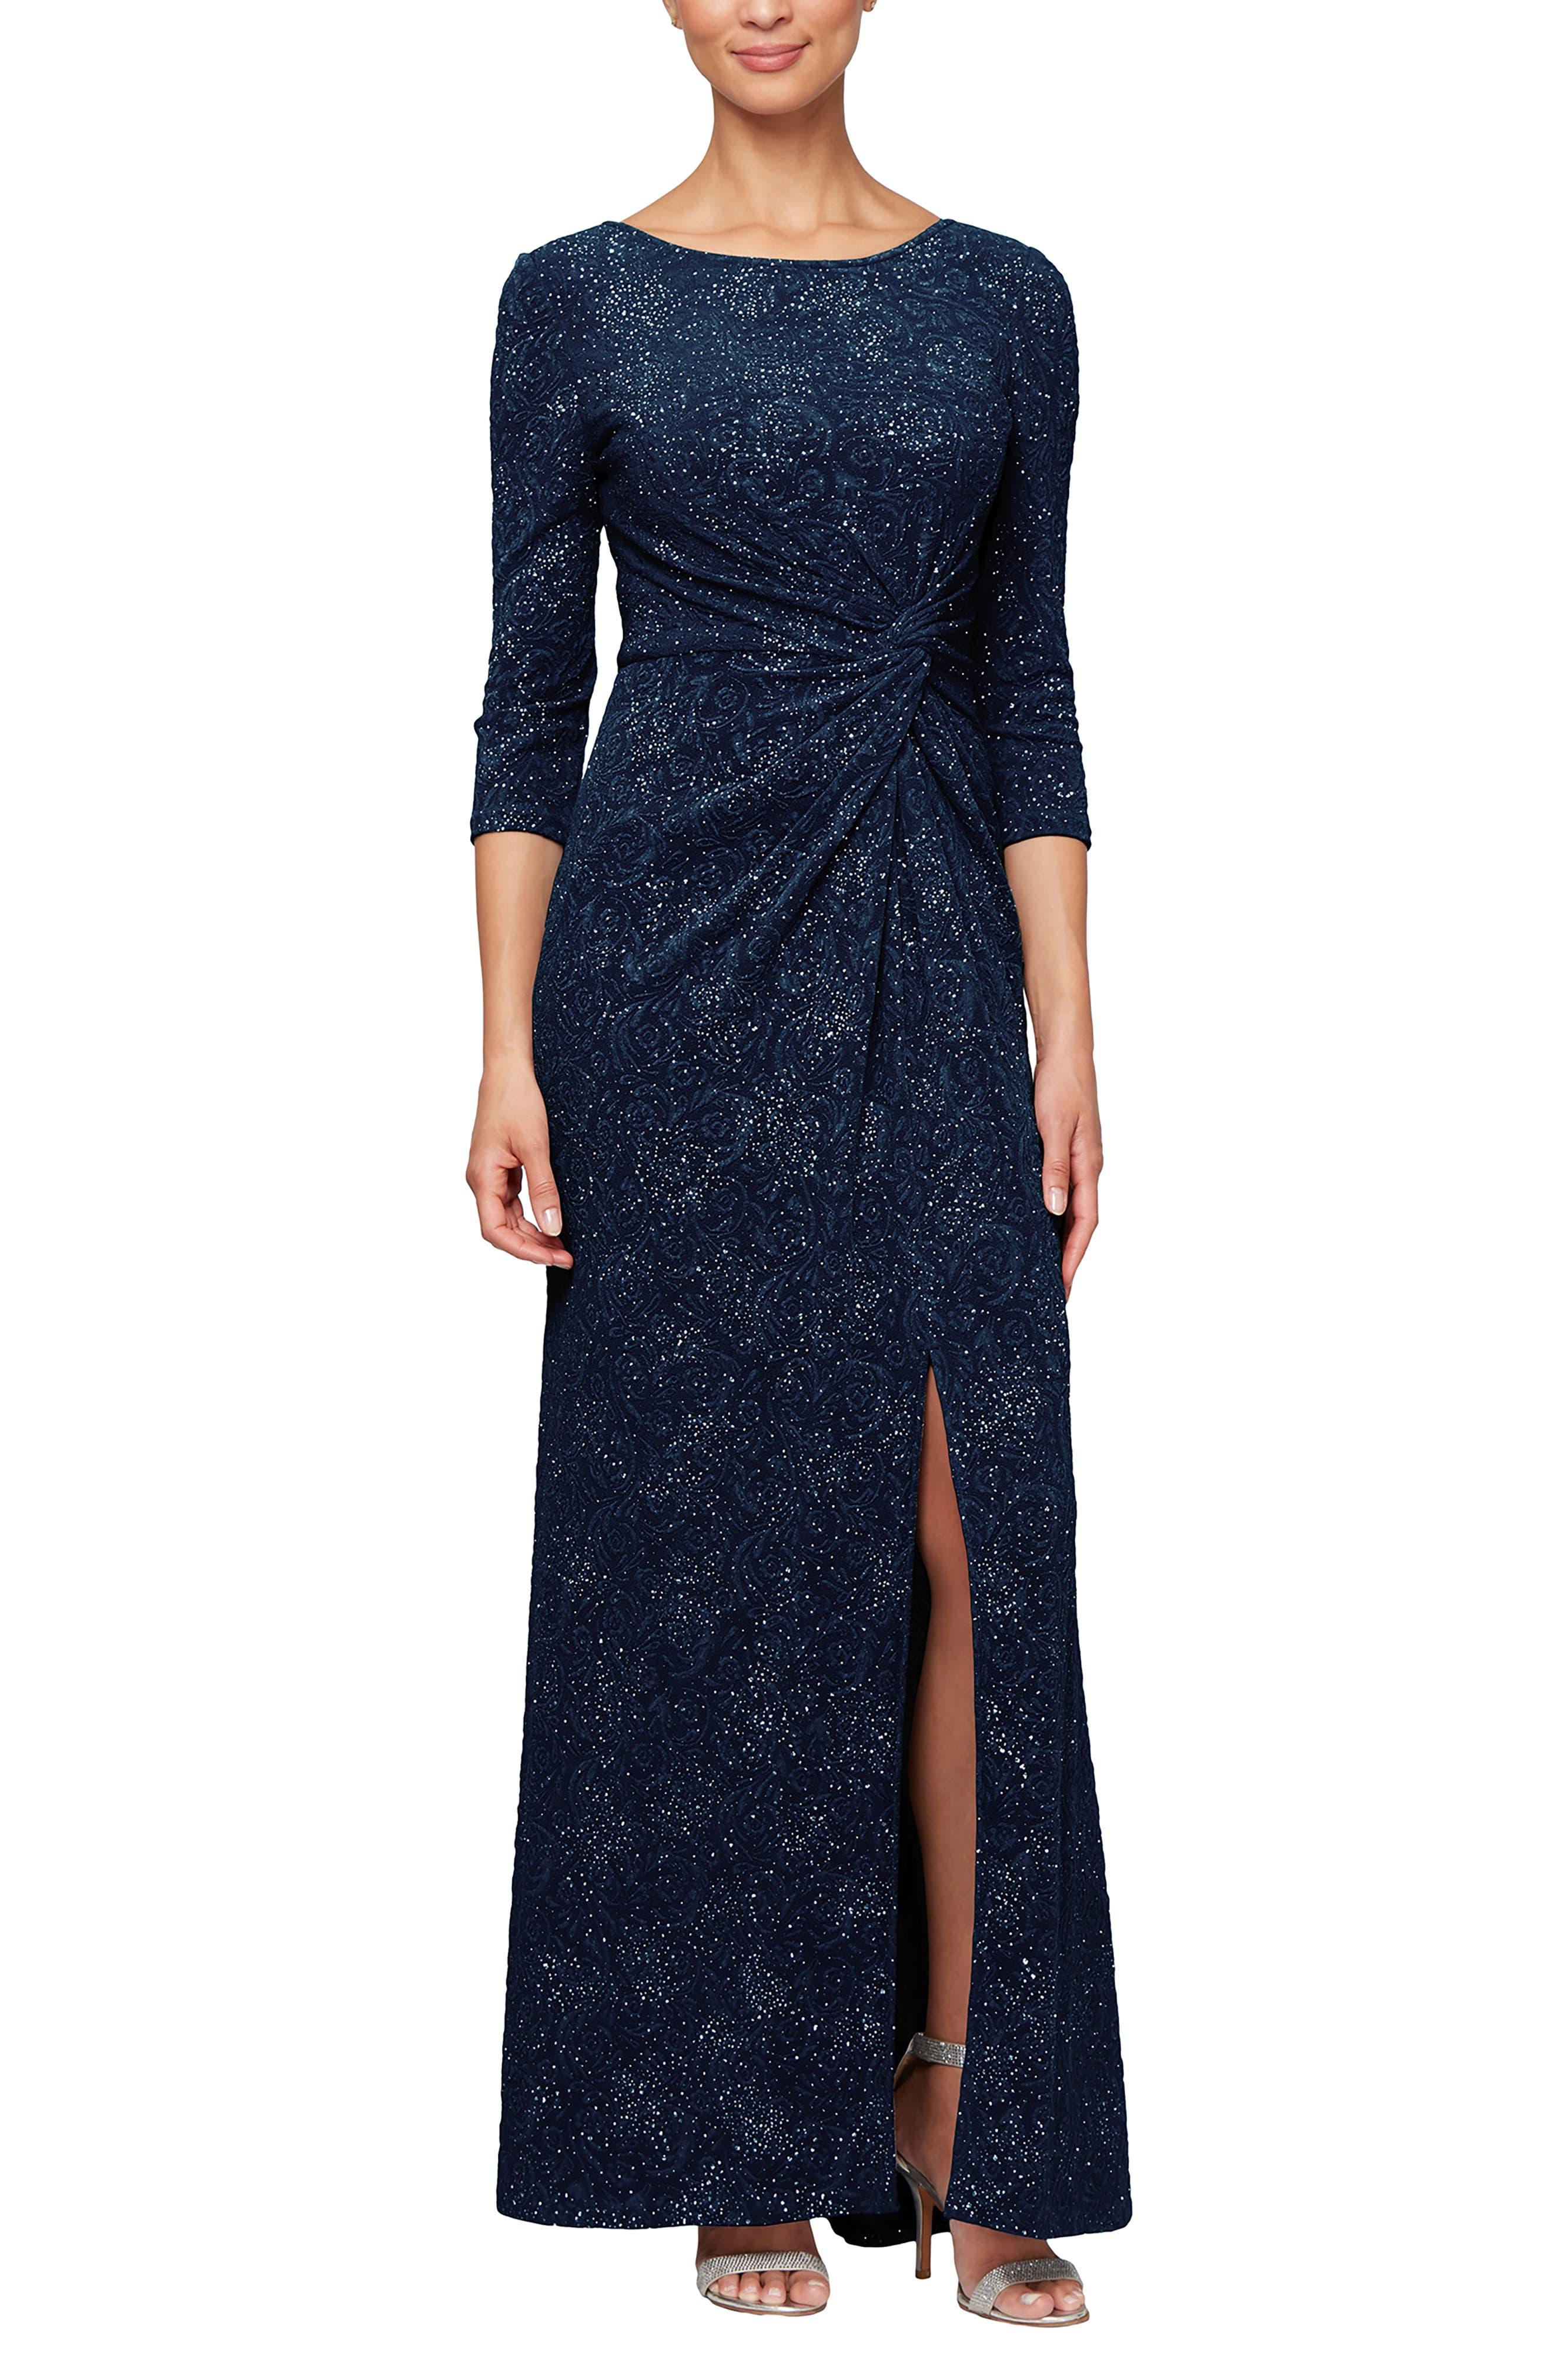 ALEX EVENINGS, Knot Front Sequin Jacquard Evening Dress, Alternate thumbnail 6, color, NAVY